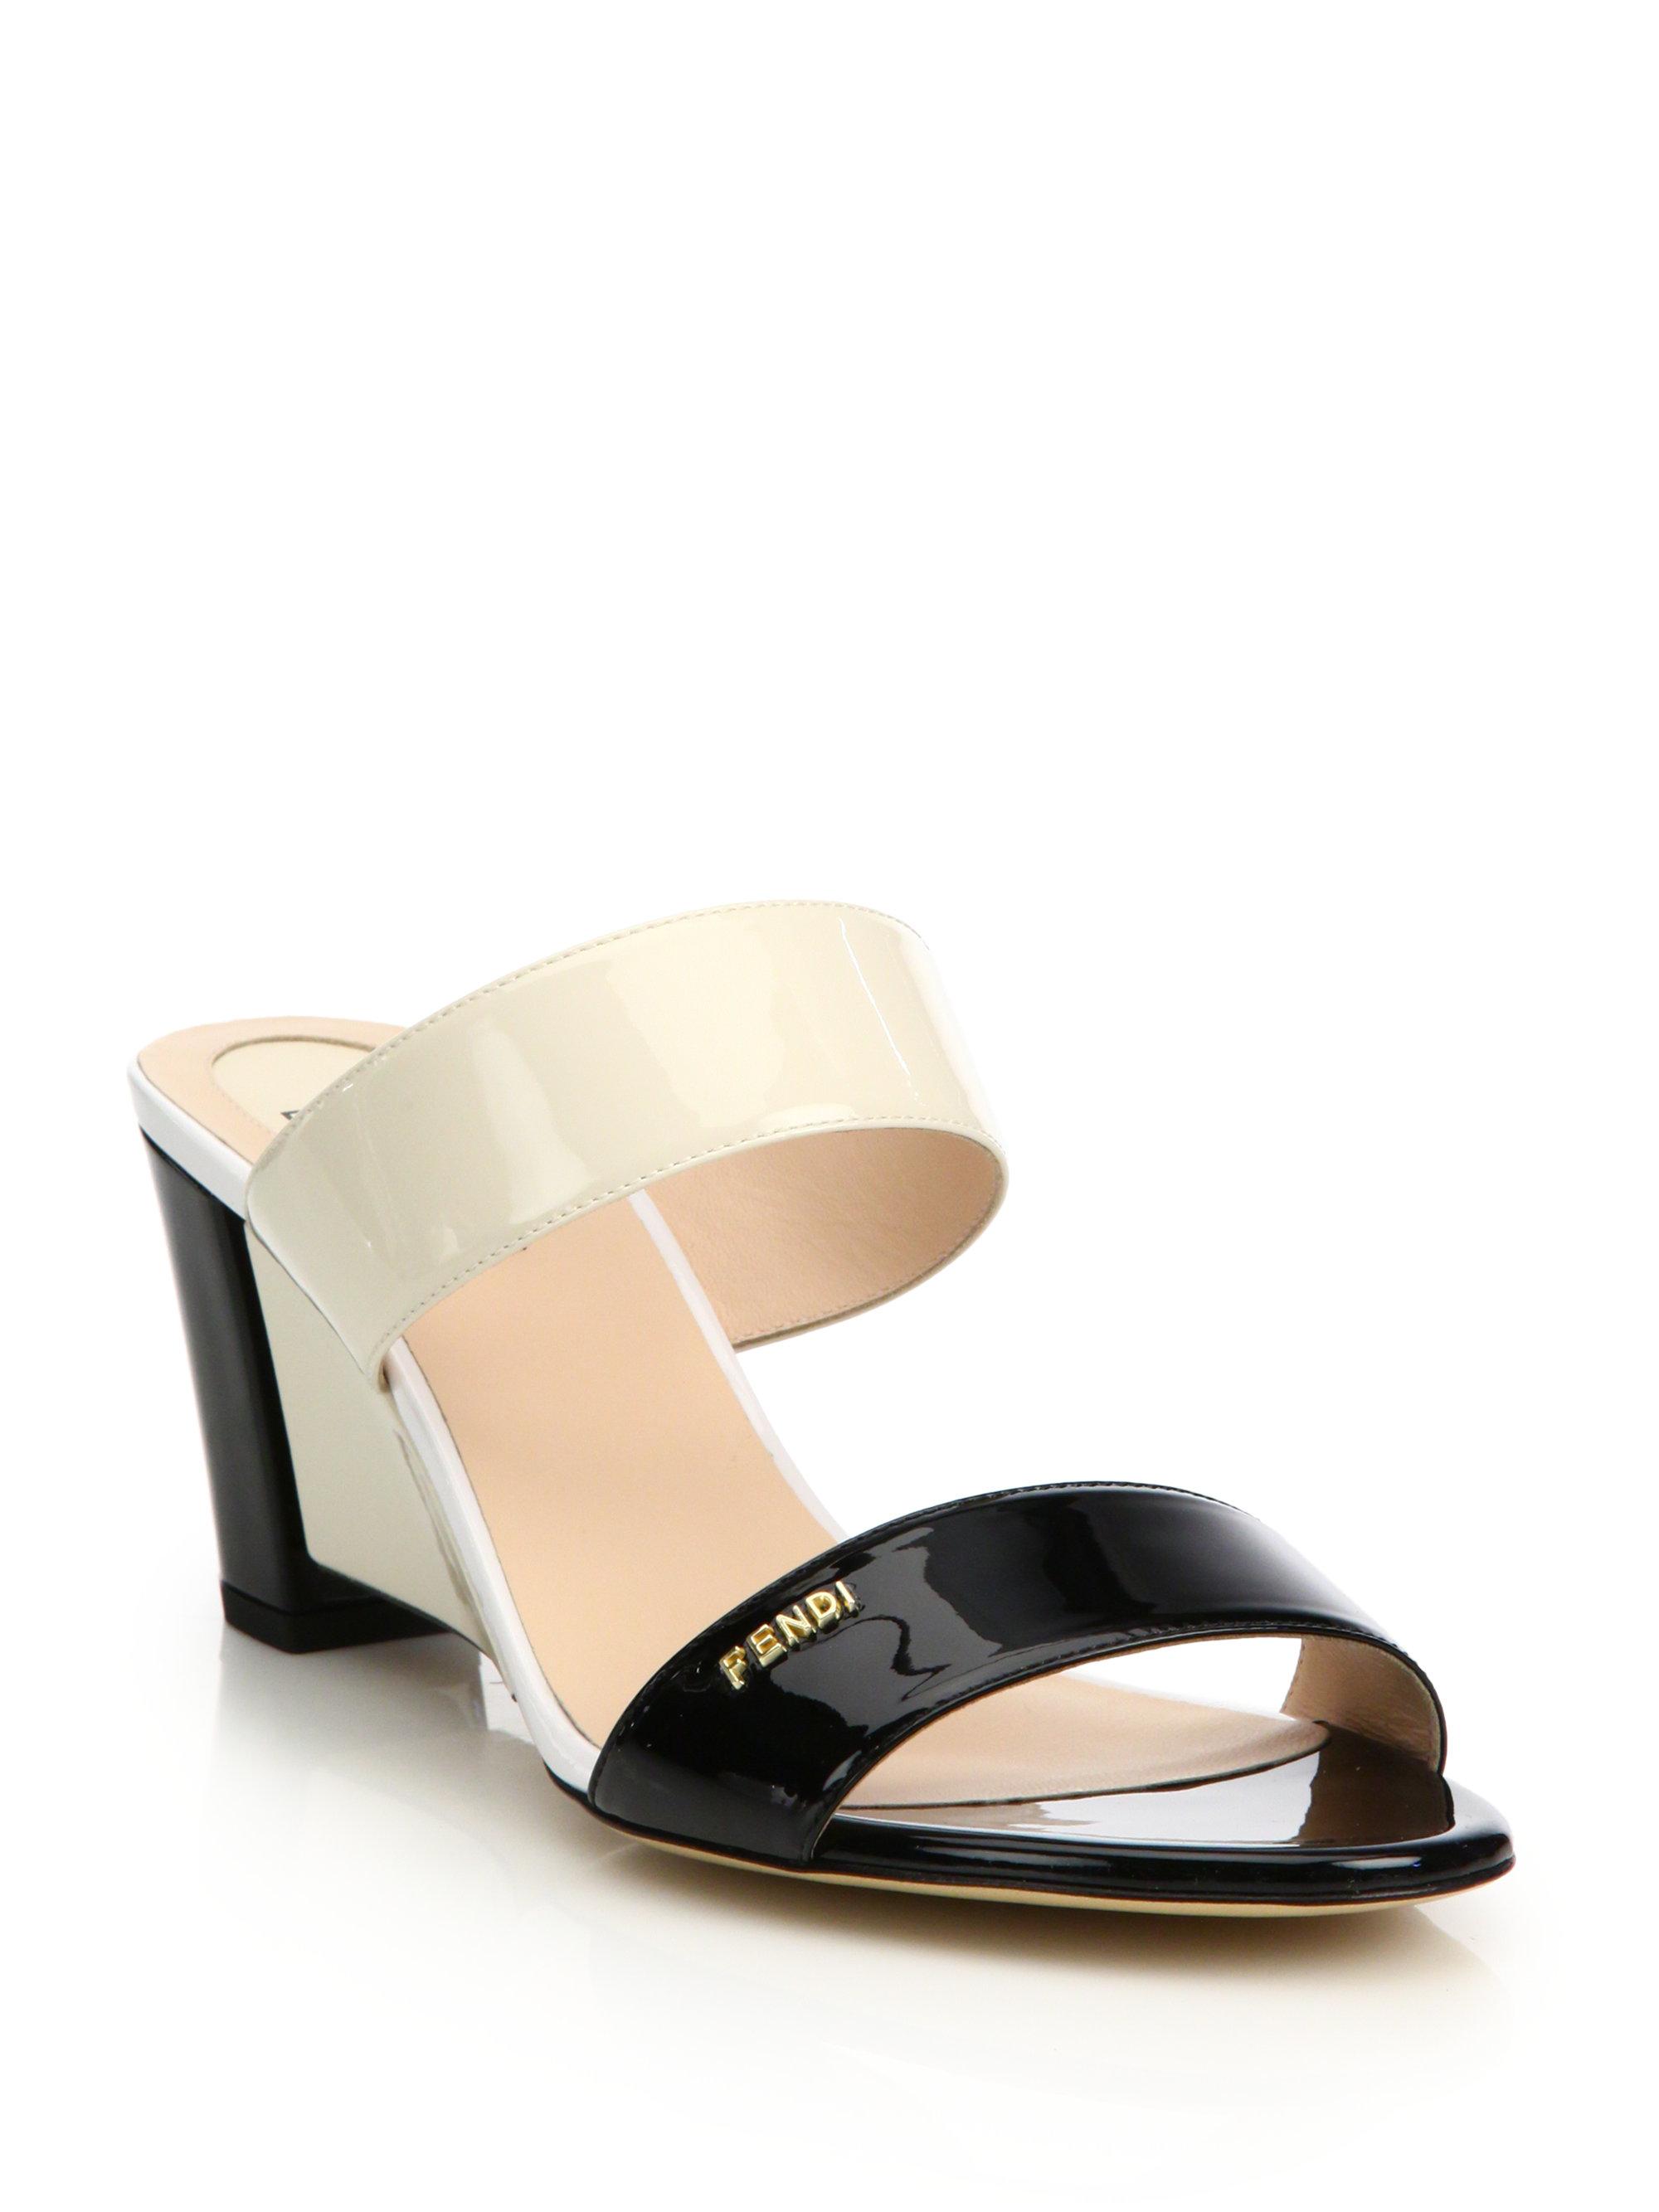 Fendi Patent Leather Sandals Cgzz3TvwA9